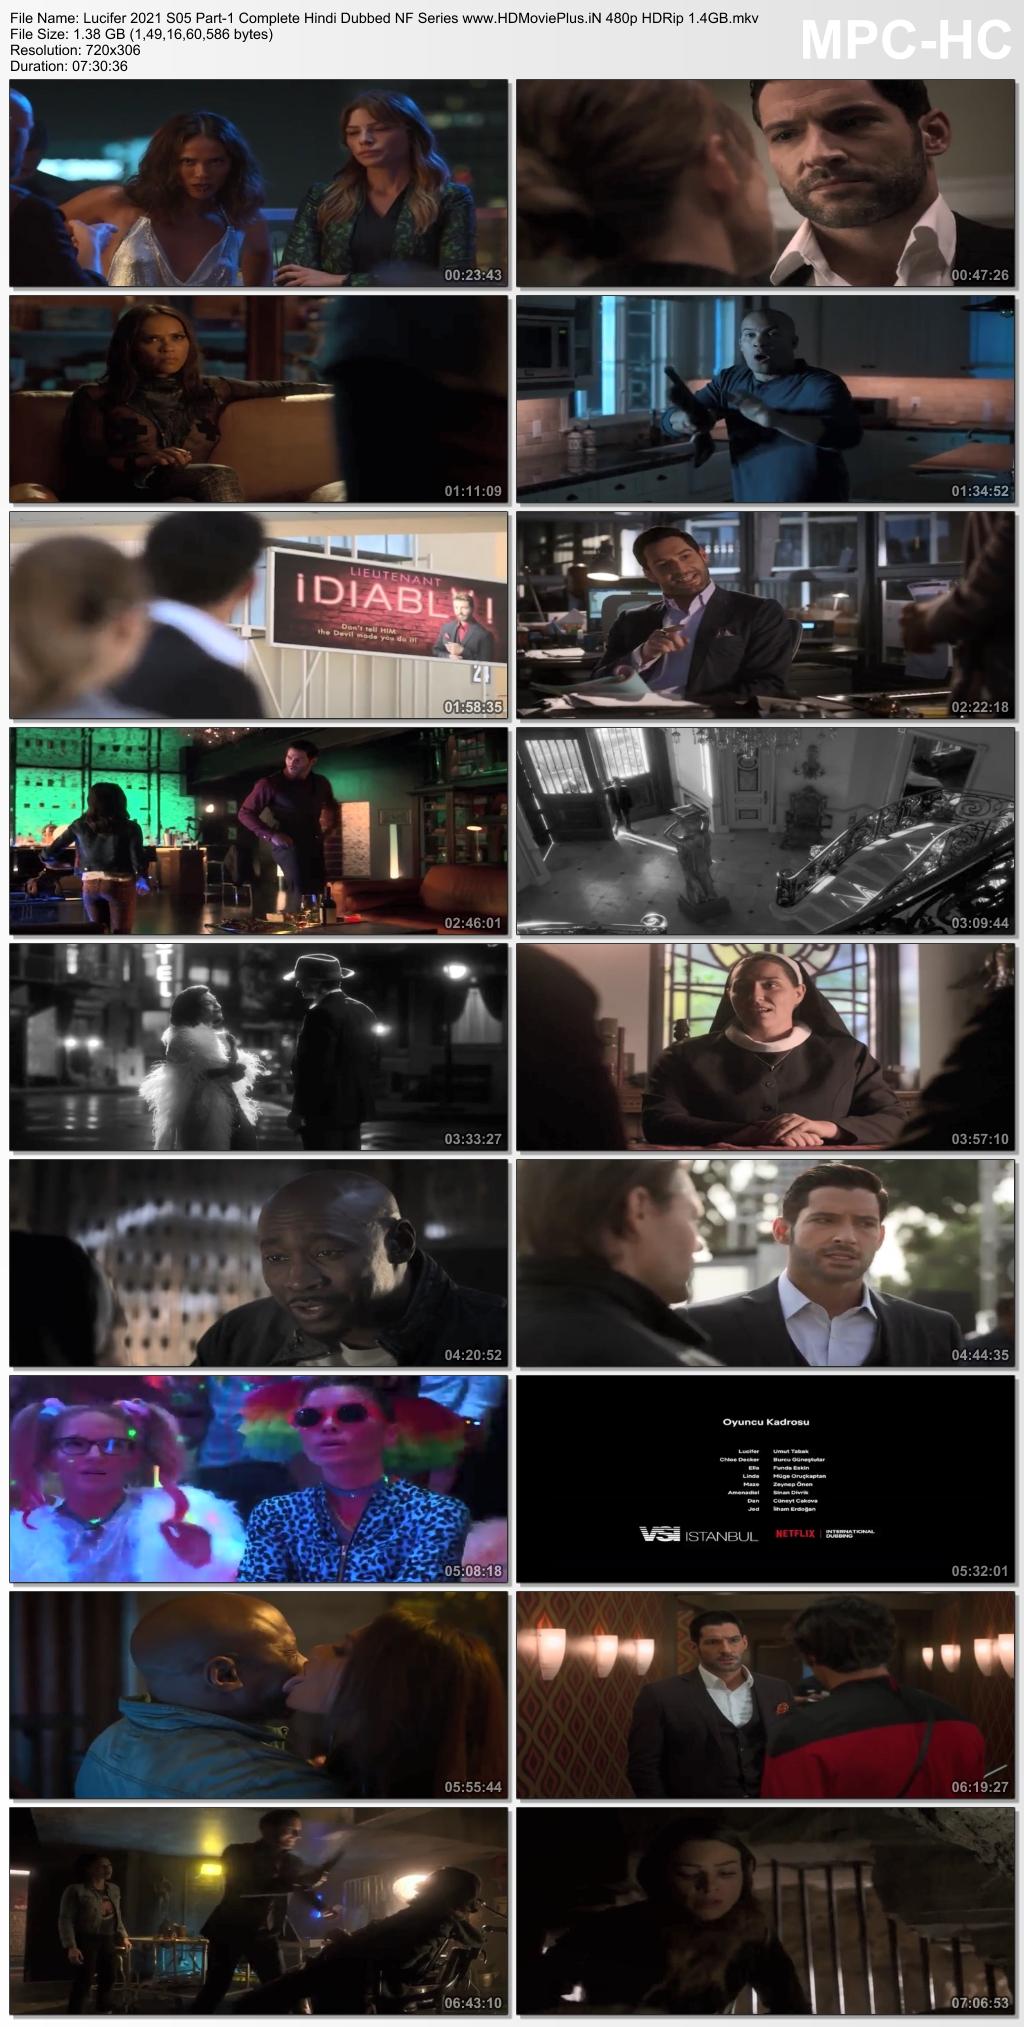 Lucifer 2020 Season 5 Part 1 Hindi